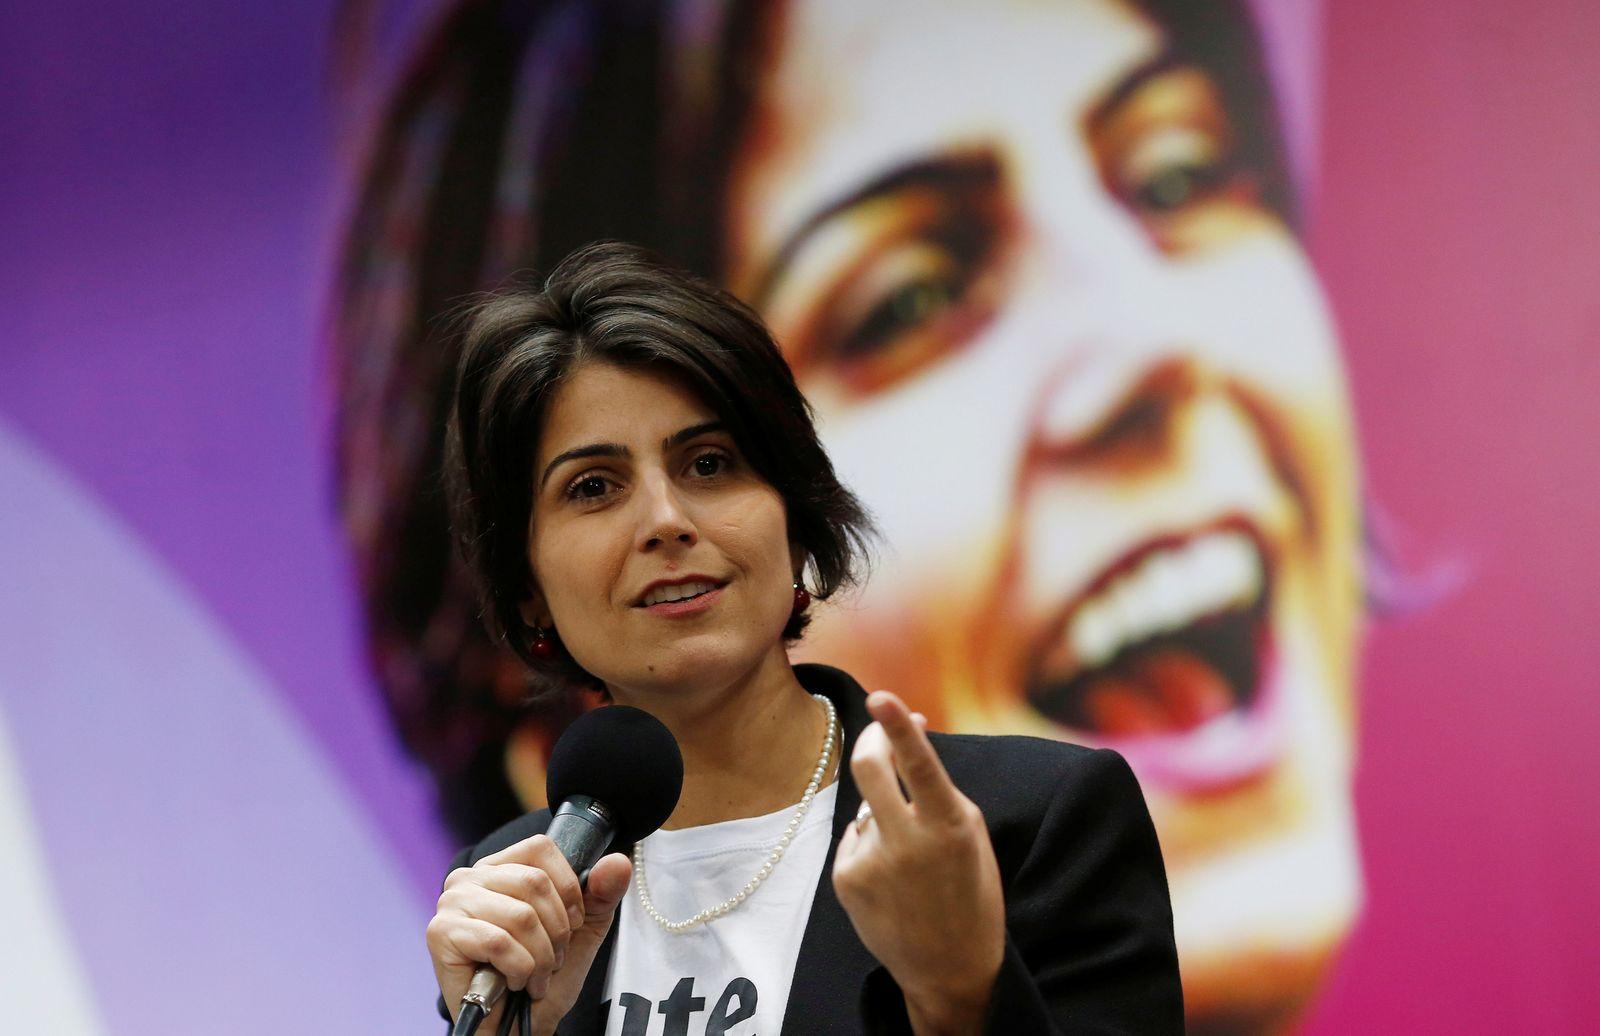 D'Avila, candidate for Brazil's presidency, speaks during the National Convention of the PC do B in Brasilia